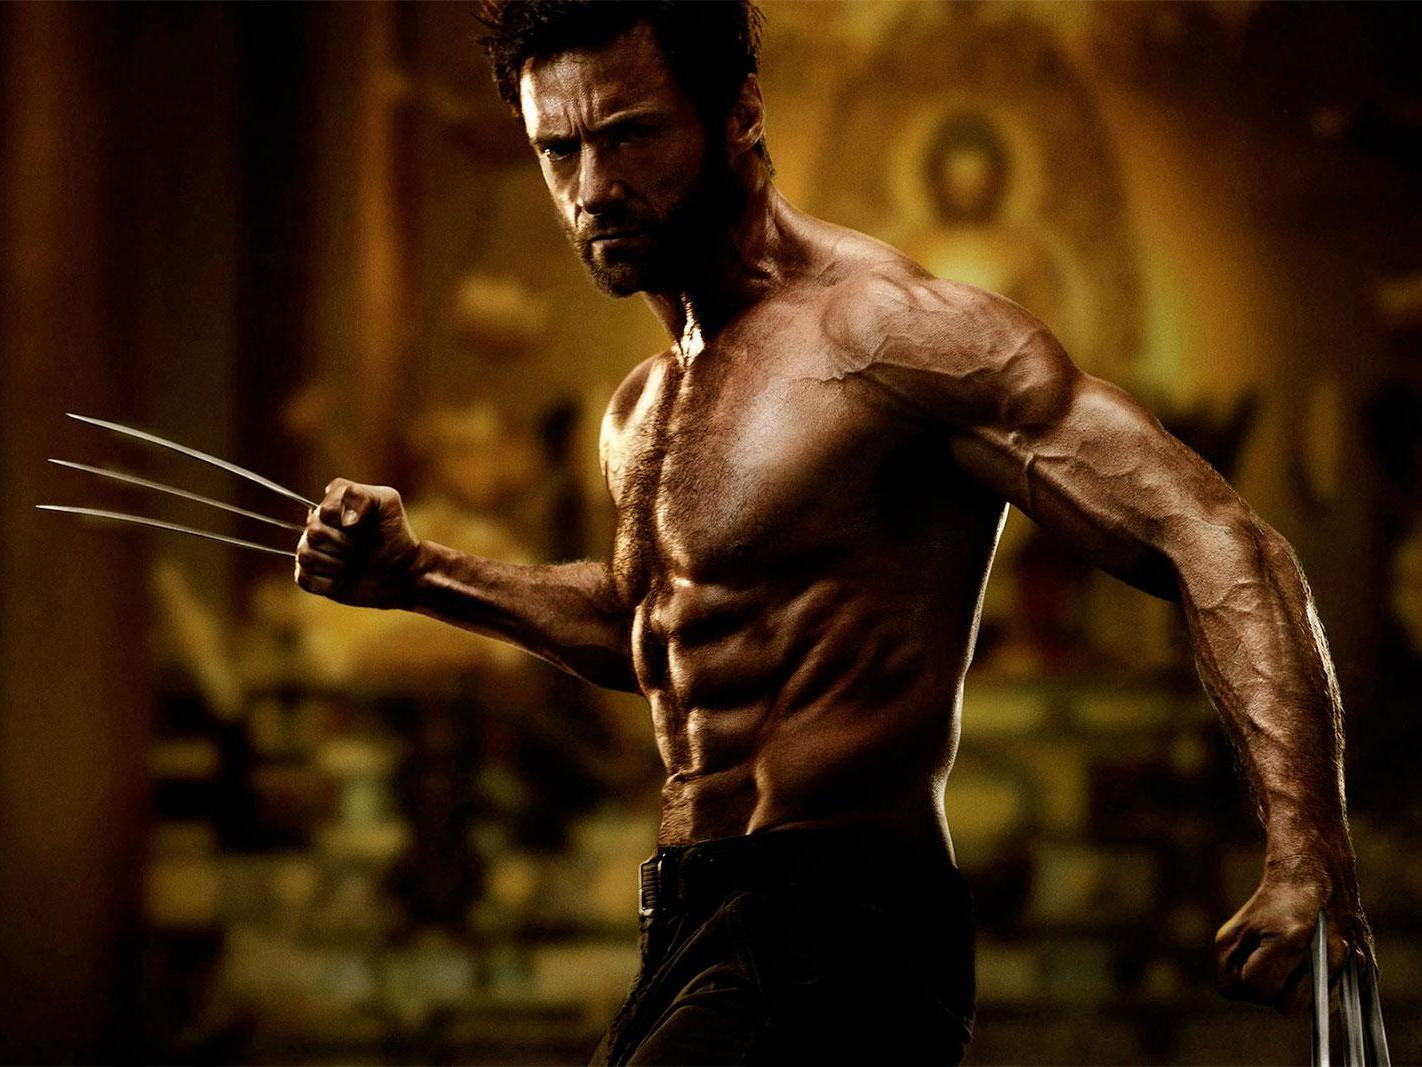 Hugh Jackman and Patrick Stewart break Marvel superhero world record with X-Men feat